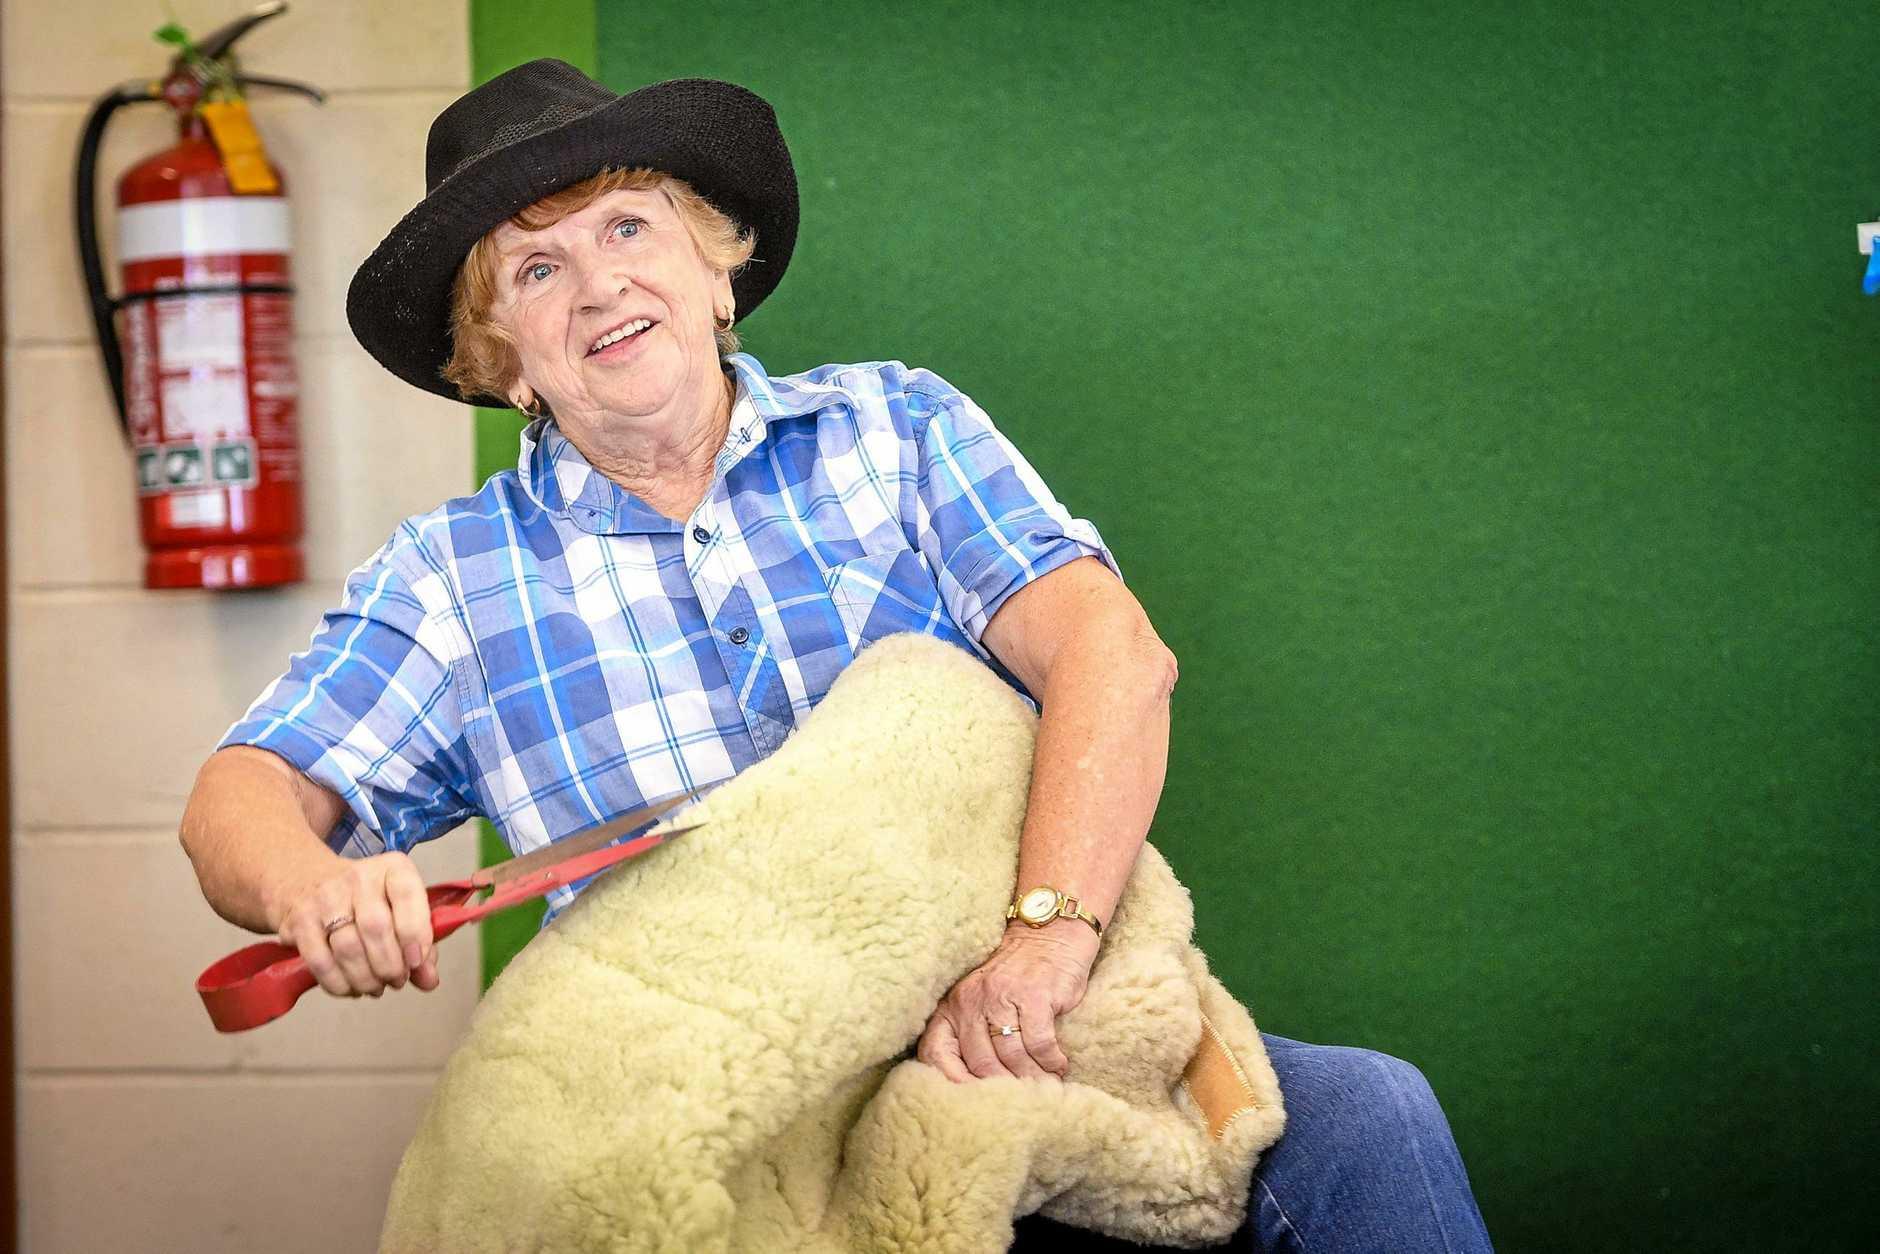 Pam Rutherford as famous Australian sheep shearer Jackie Howe the Gladstone Presbyterian Women's Association fundraiser.